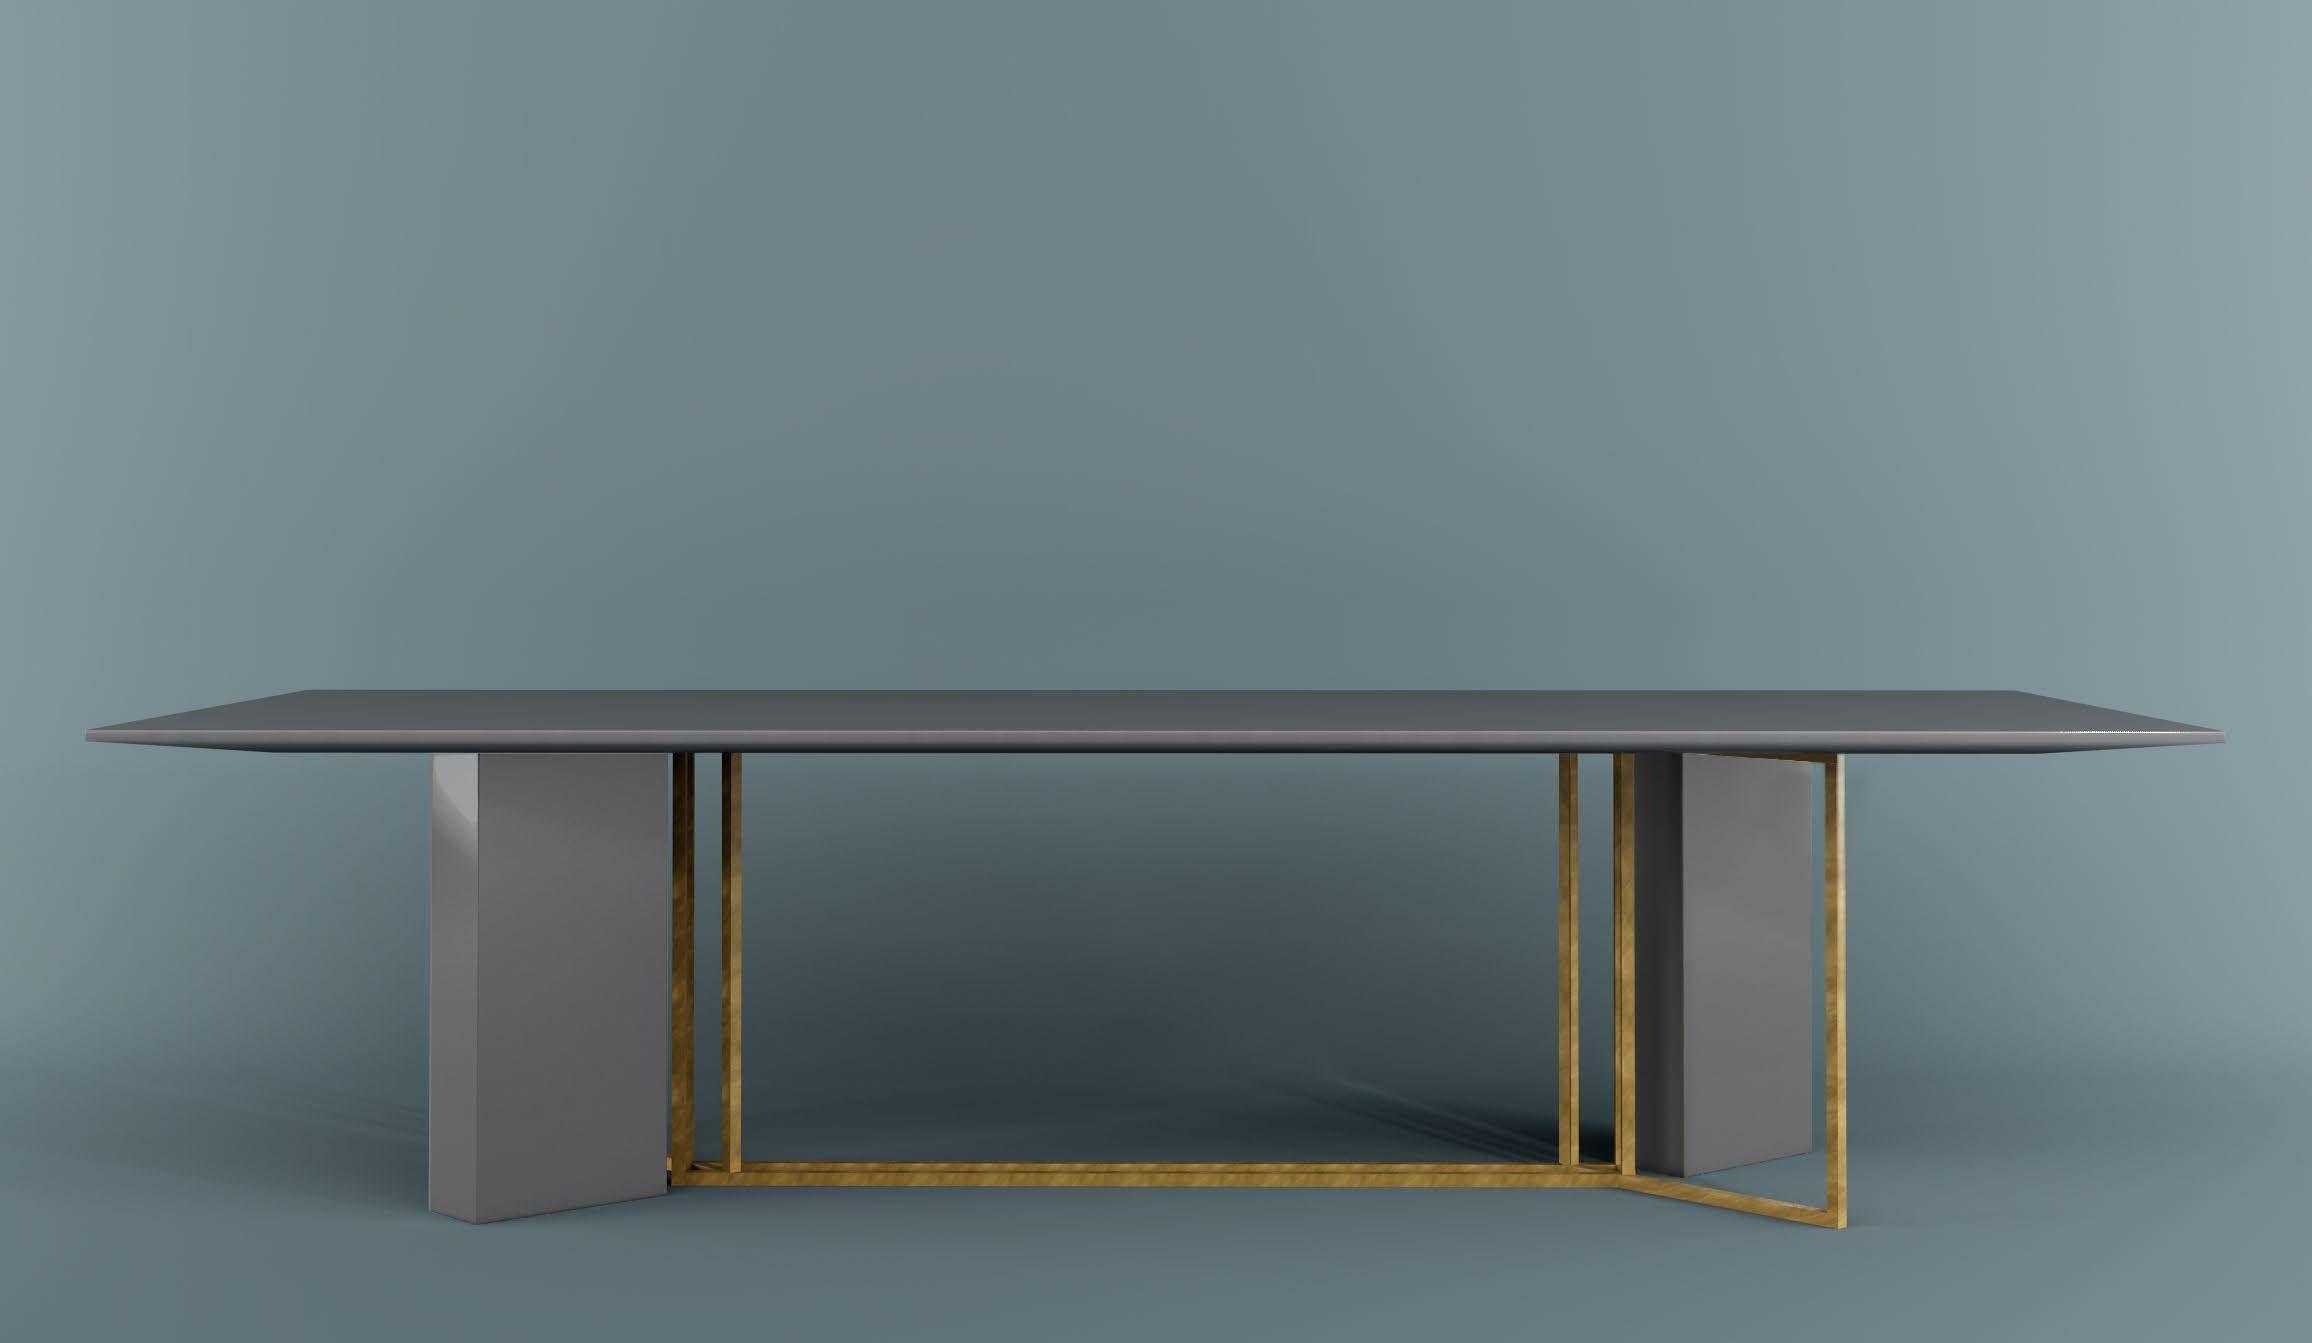 Meridiani arredamento ~ Plinto rectangular table by meridiani design andrea parisio